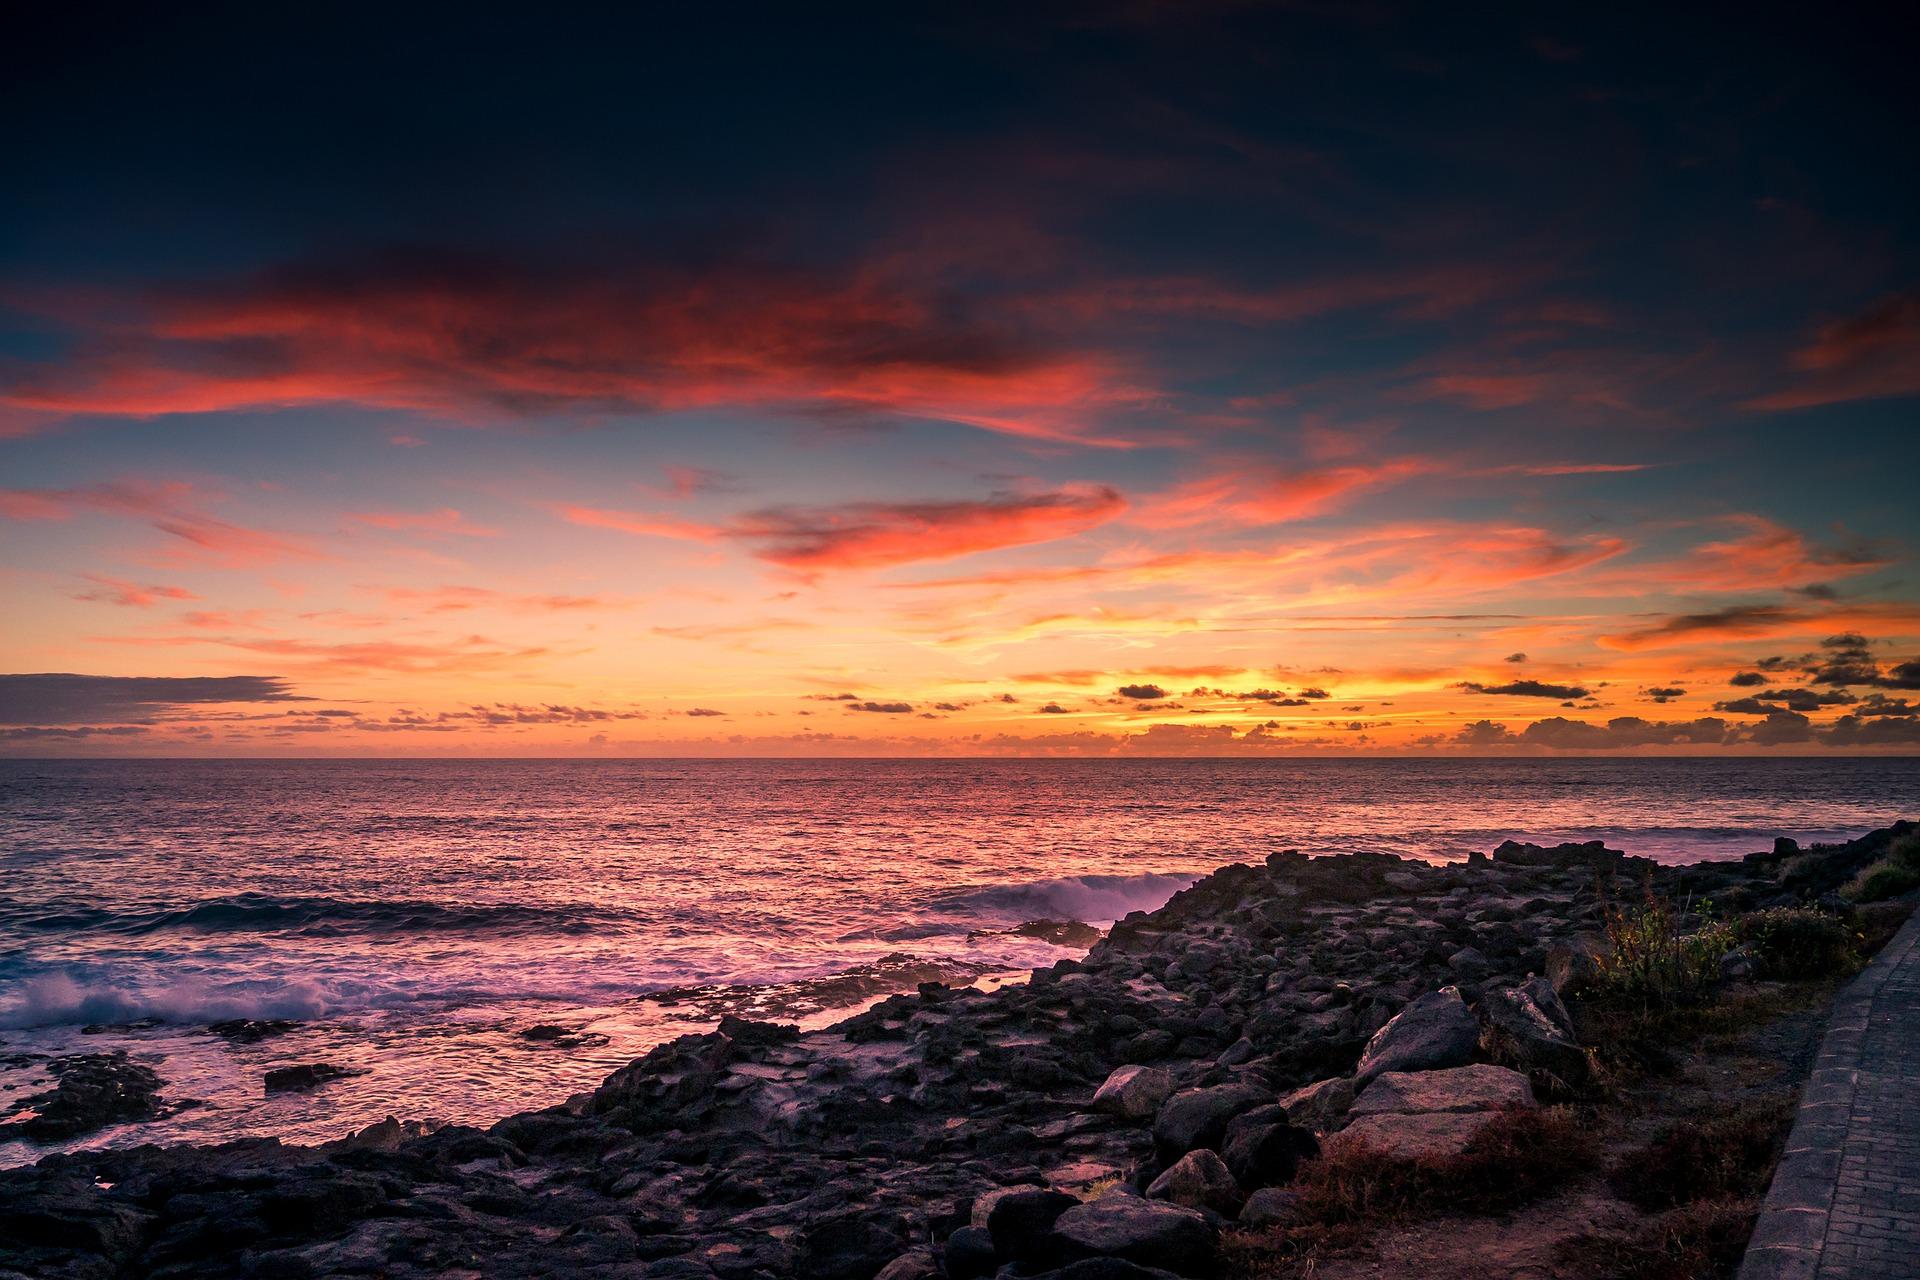 sunset-3095031_1920